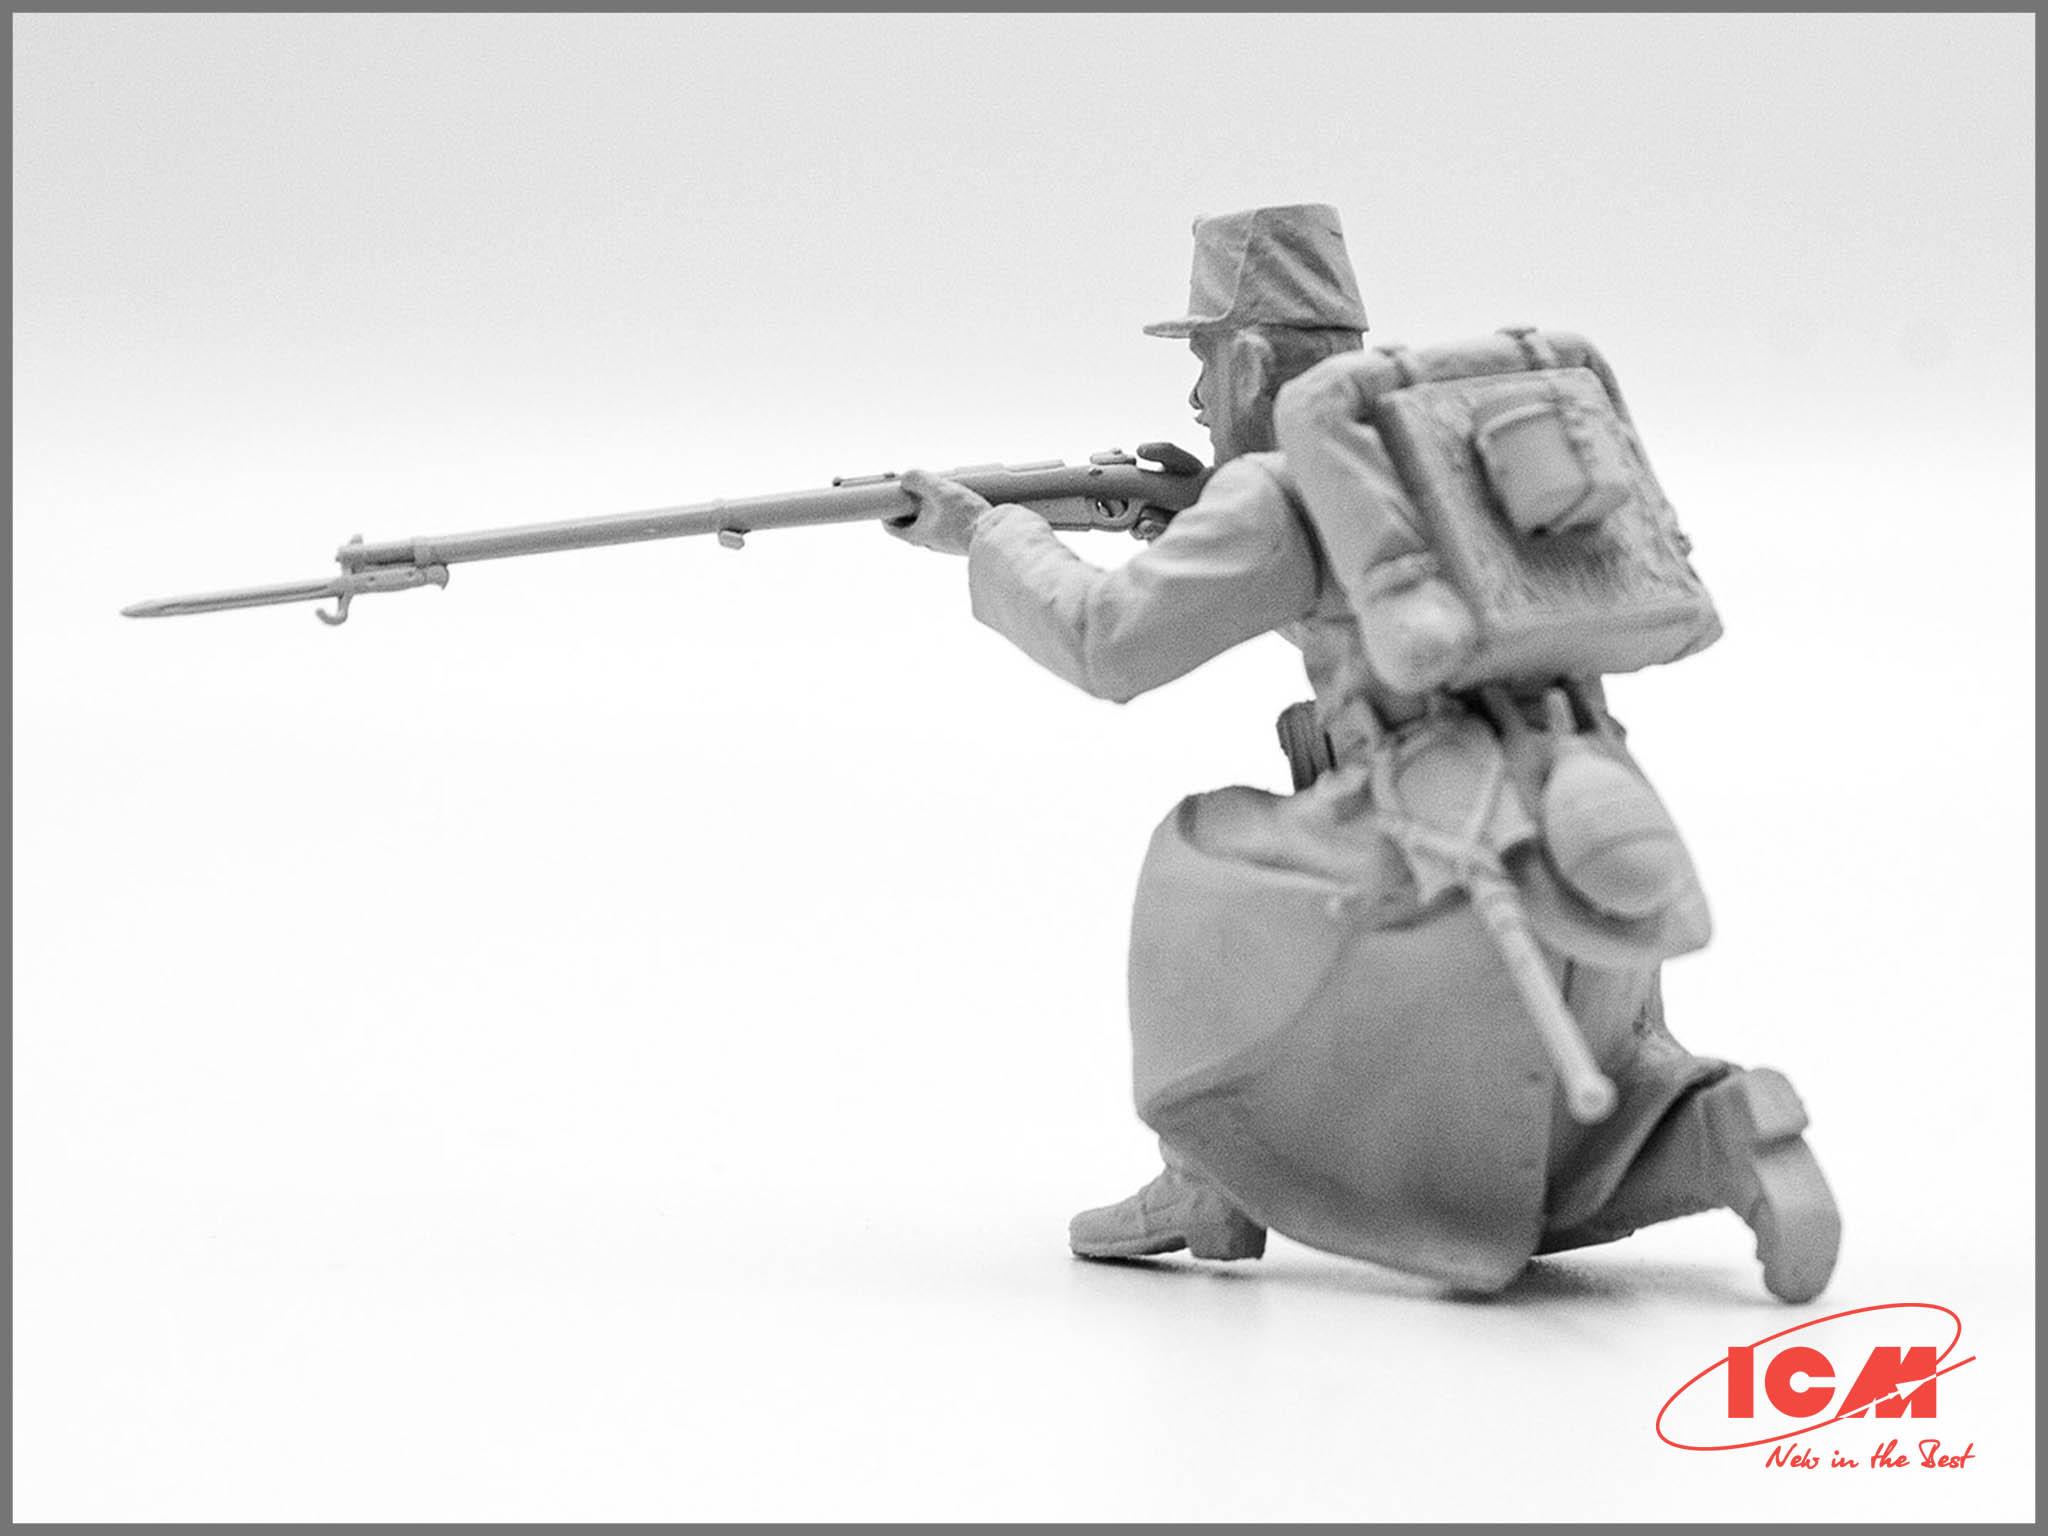 35680_cropped_Belgian_infantry_icm_6